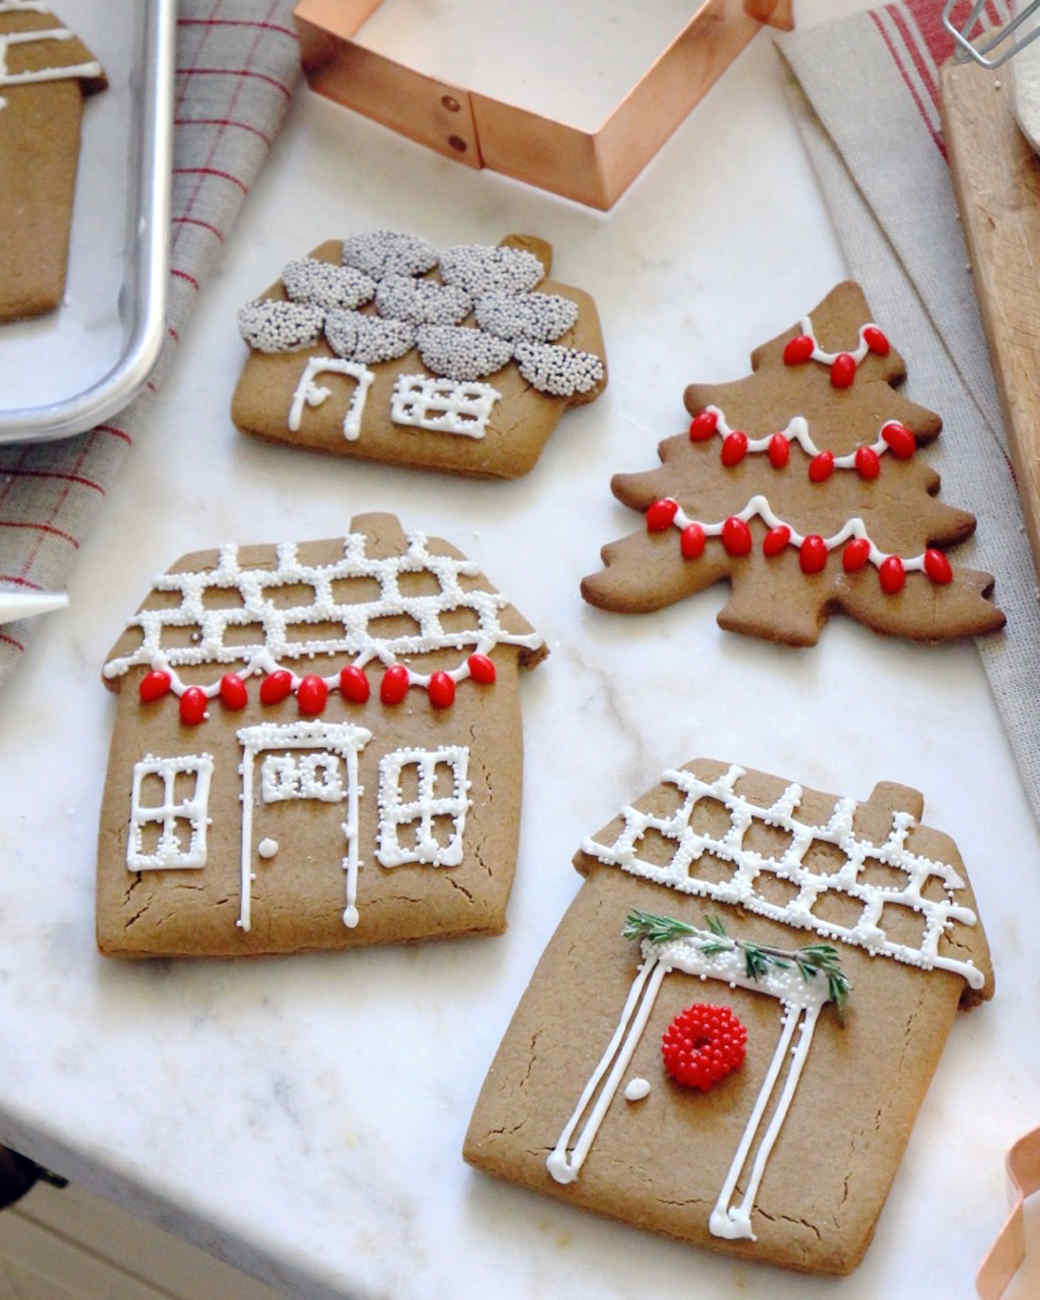 gingerbread-house-cookie-jennysteffens-1115.jpg